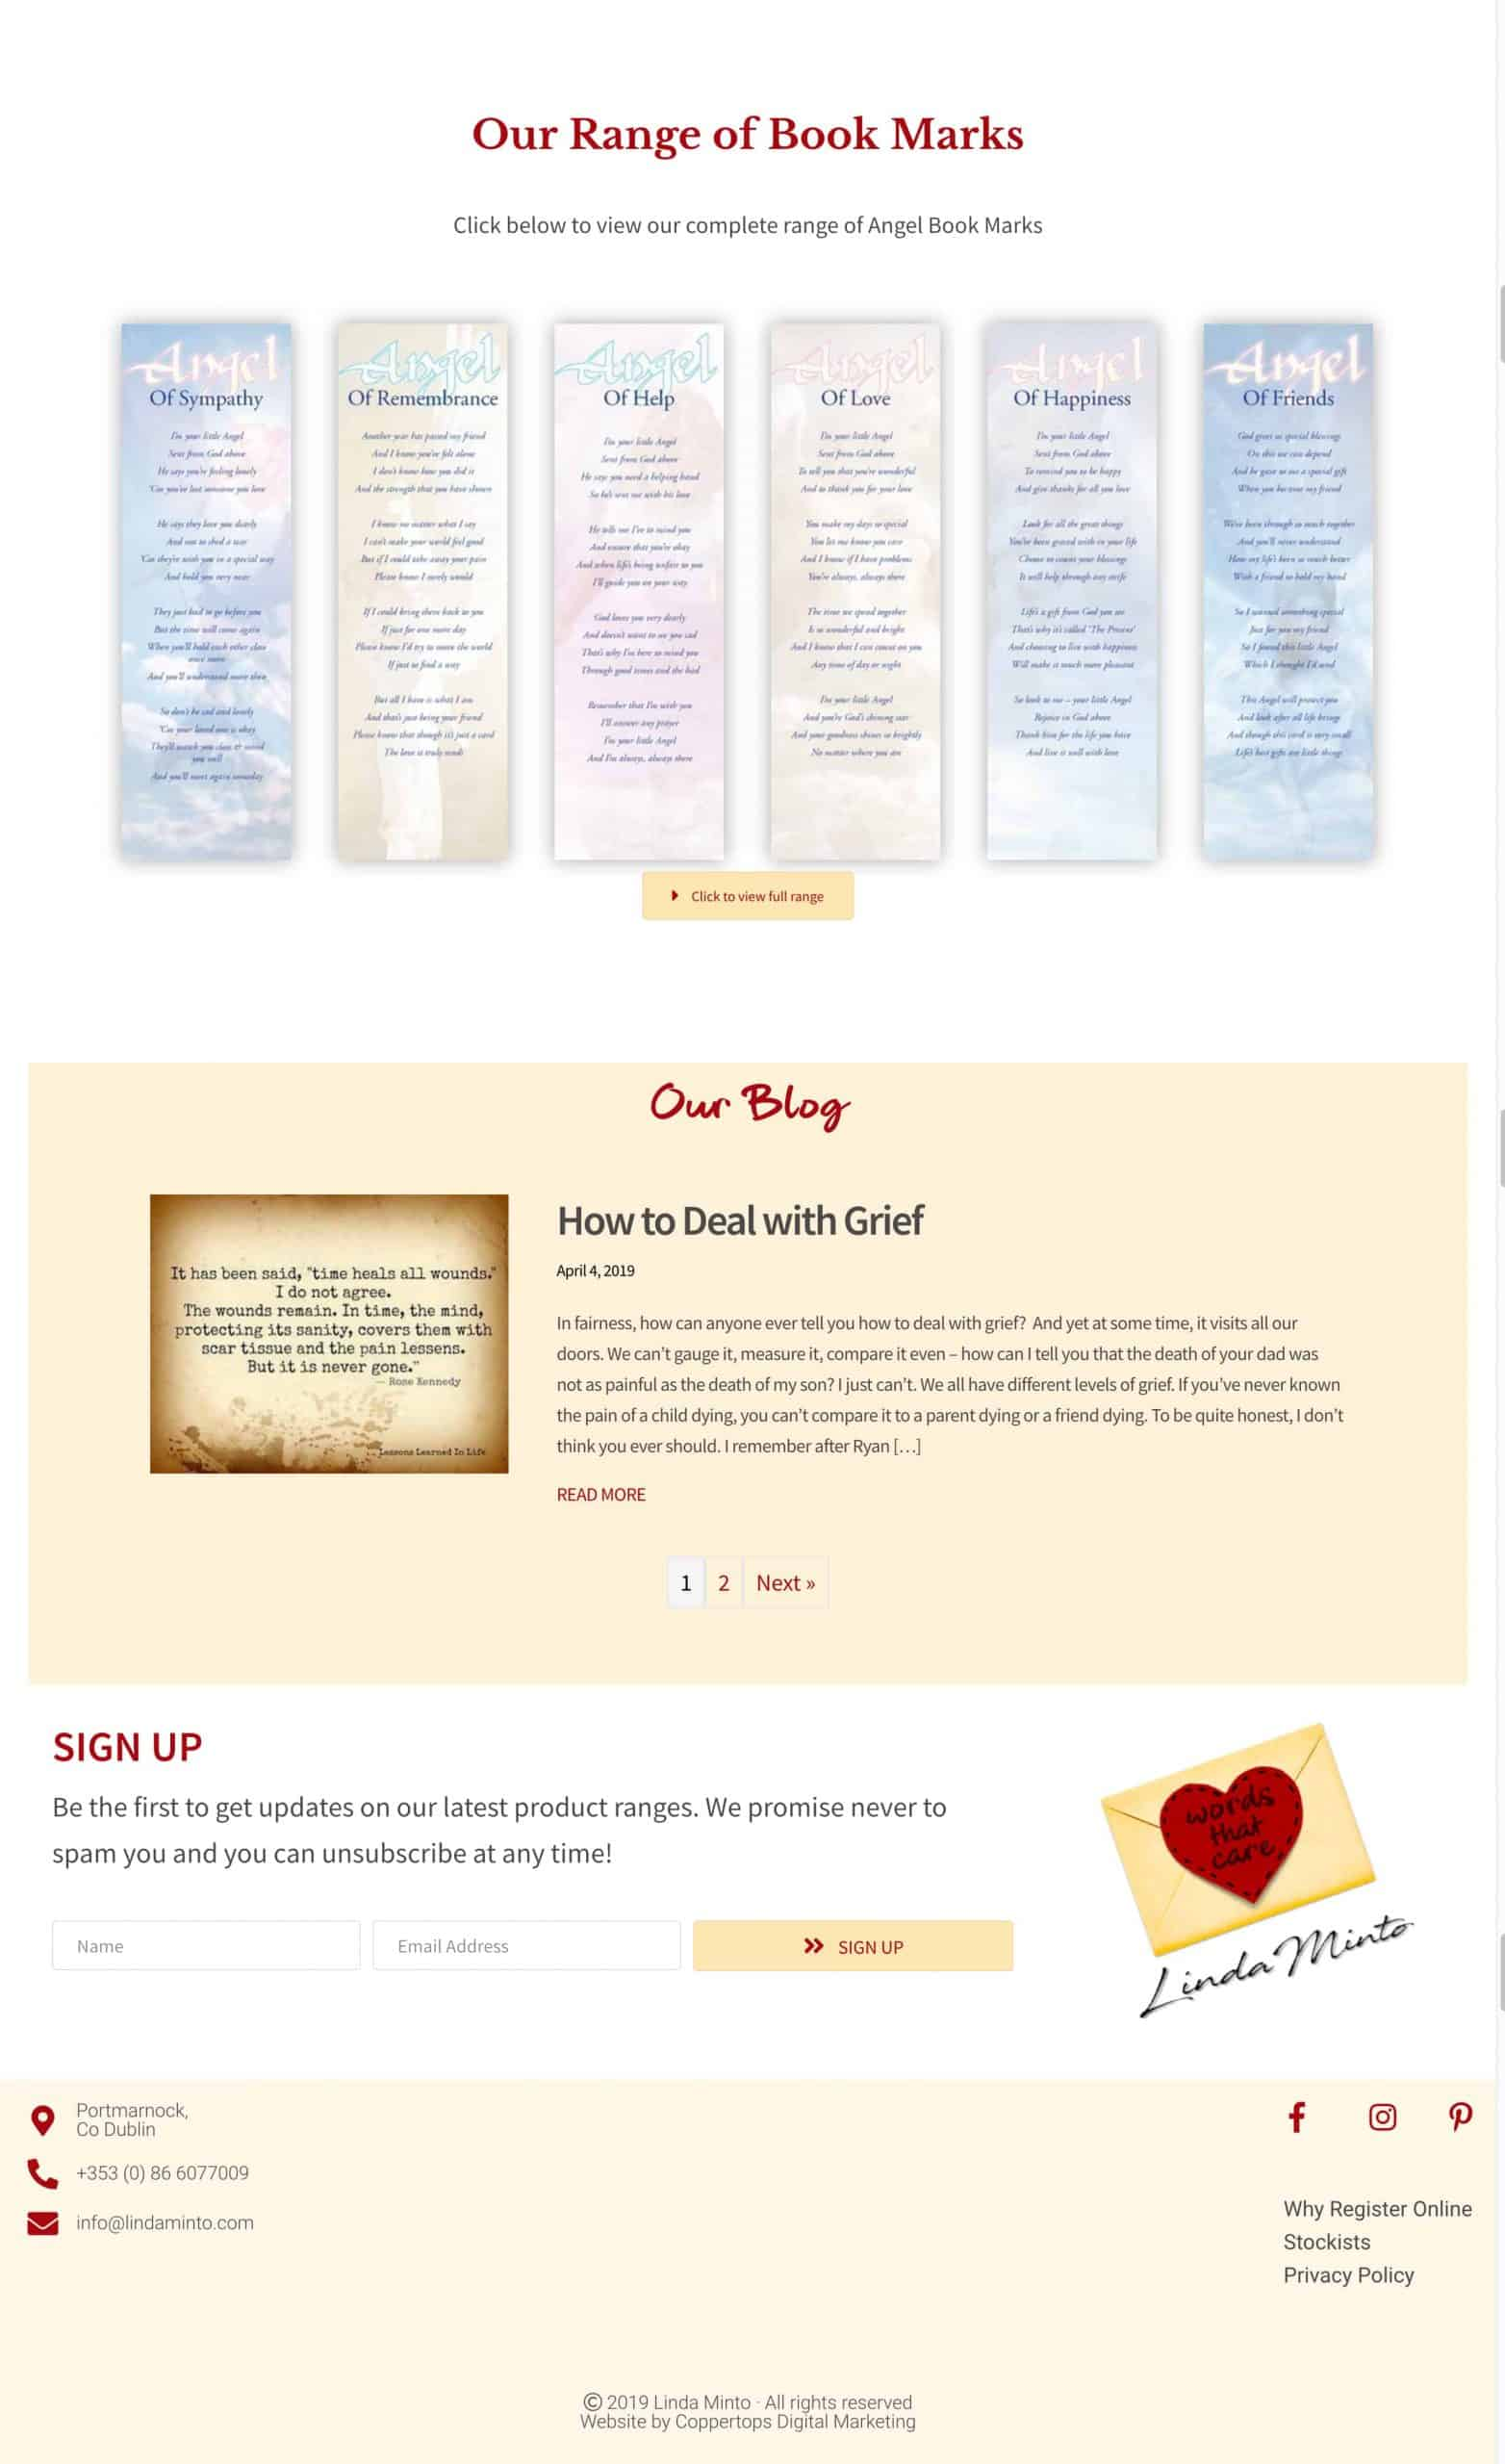 Linda Minto Cards web design